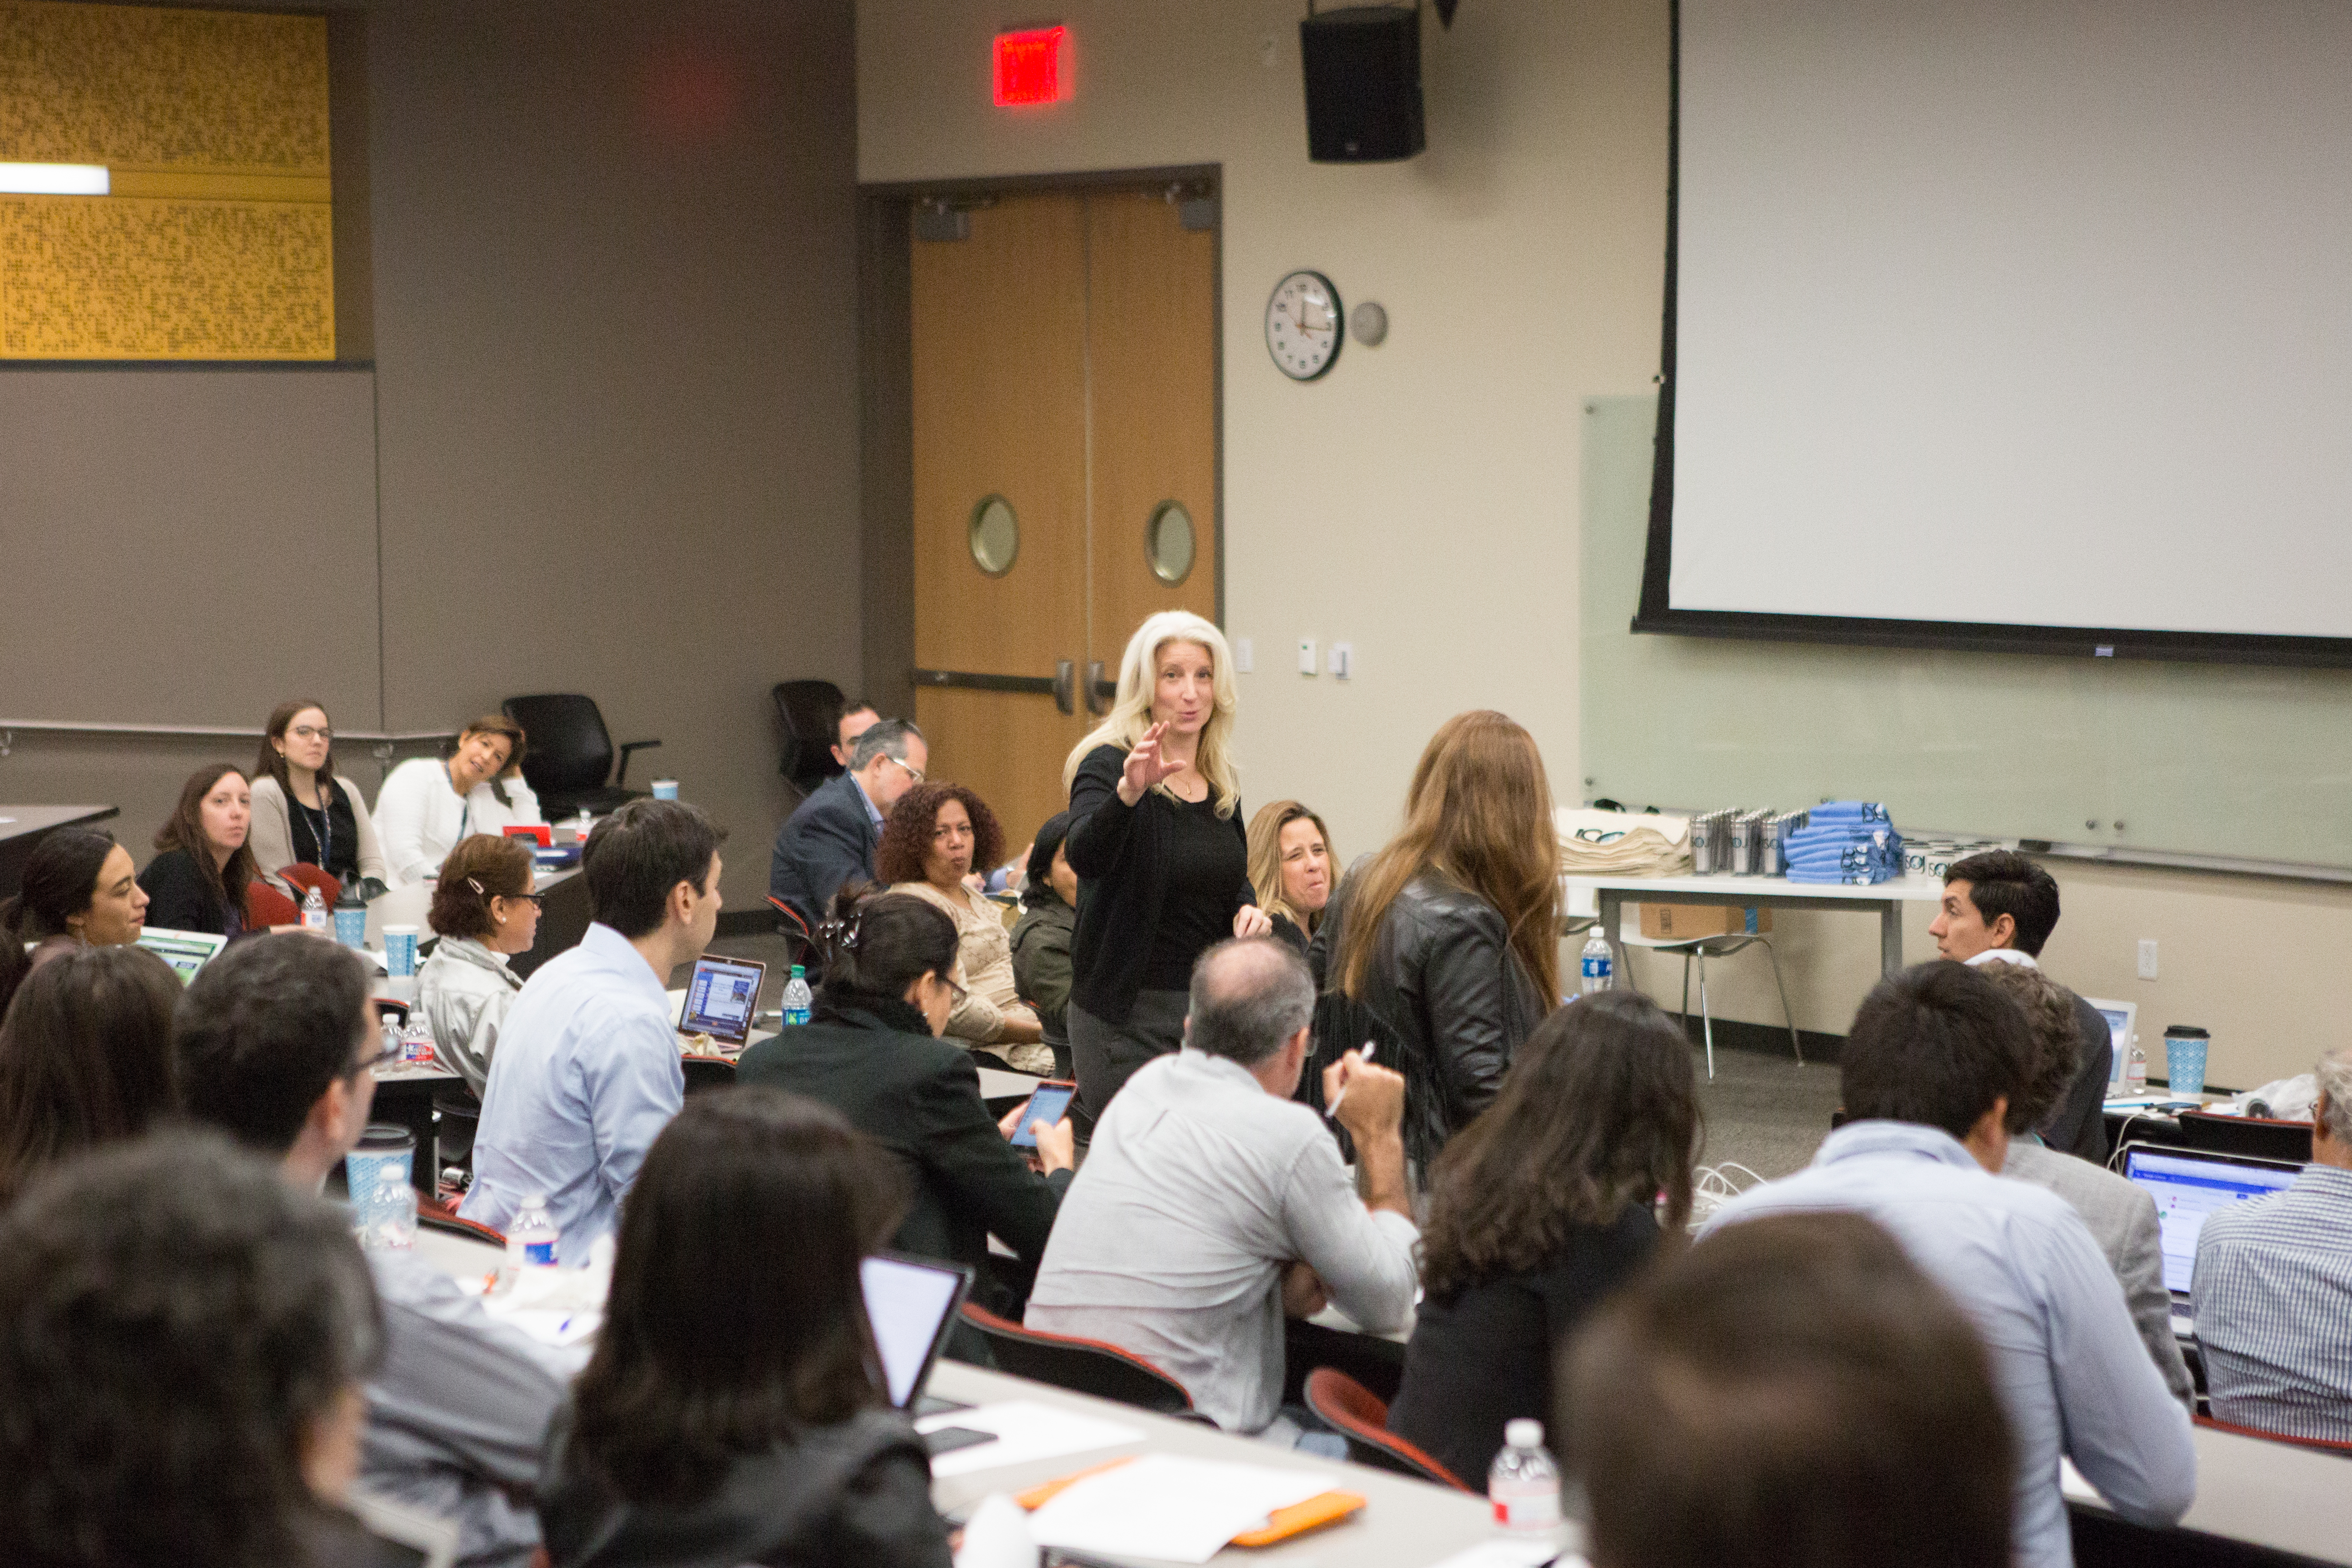 Janine Warner presents the results of SembraMedia's study of digital media in Latin America.